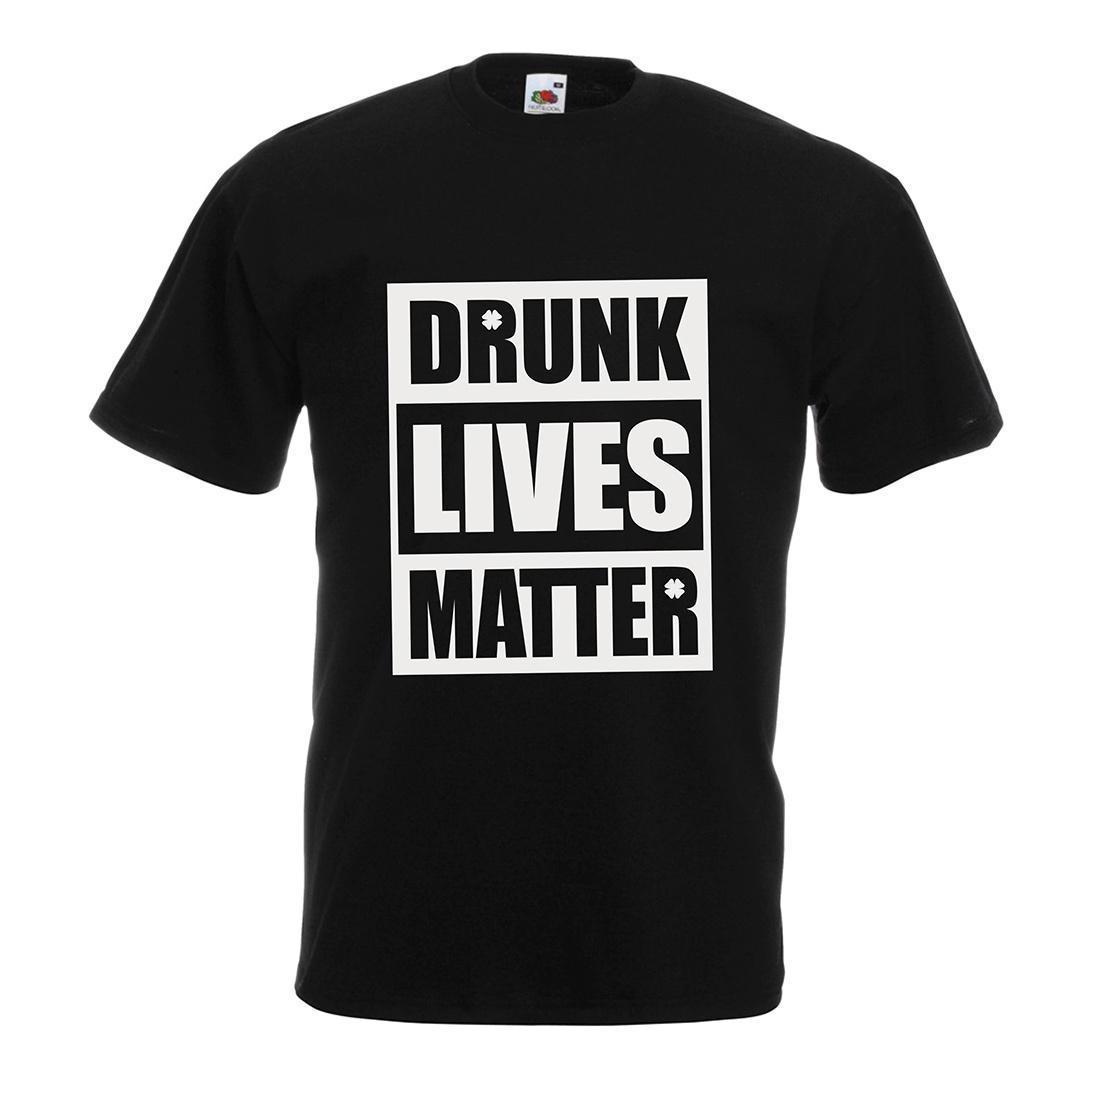 058dde863 Drunk Lives Matter Funny Saint Patrick'S Shirts For Mens, St Patty'S Day T  Shirt Making Companies 7 T Shirt From Lijian82, $12.08| DHgate.Com